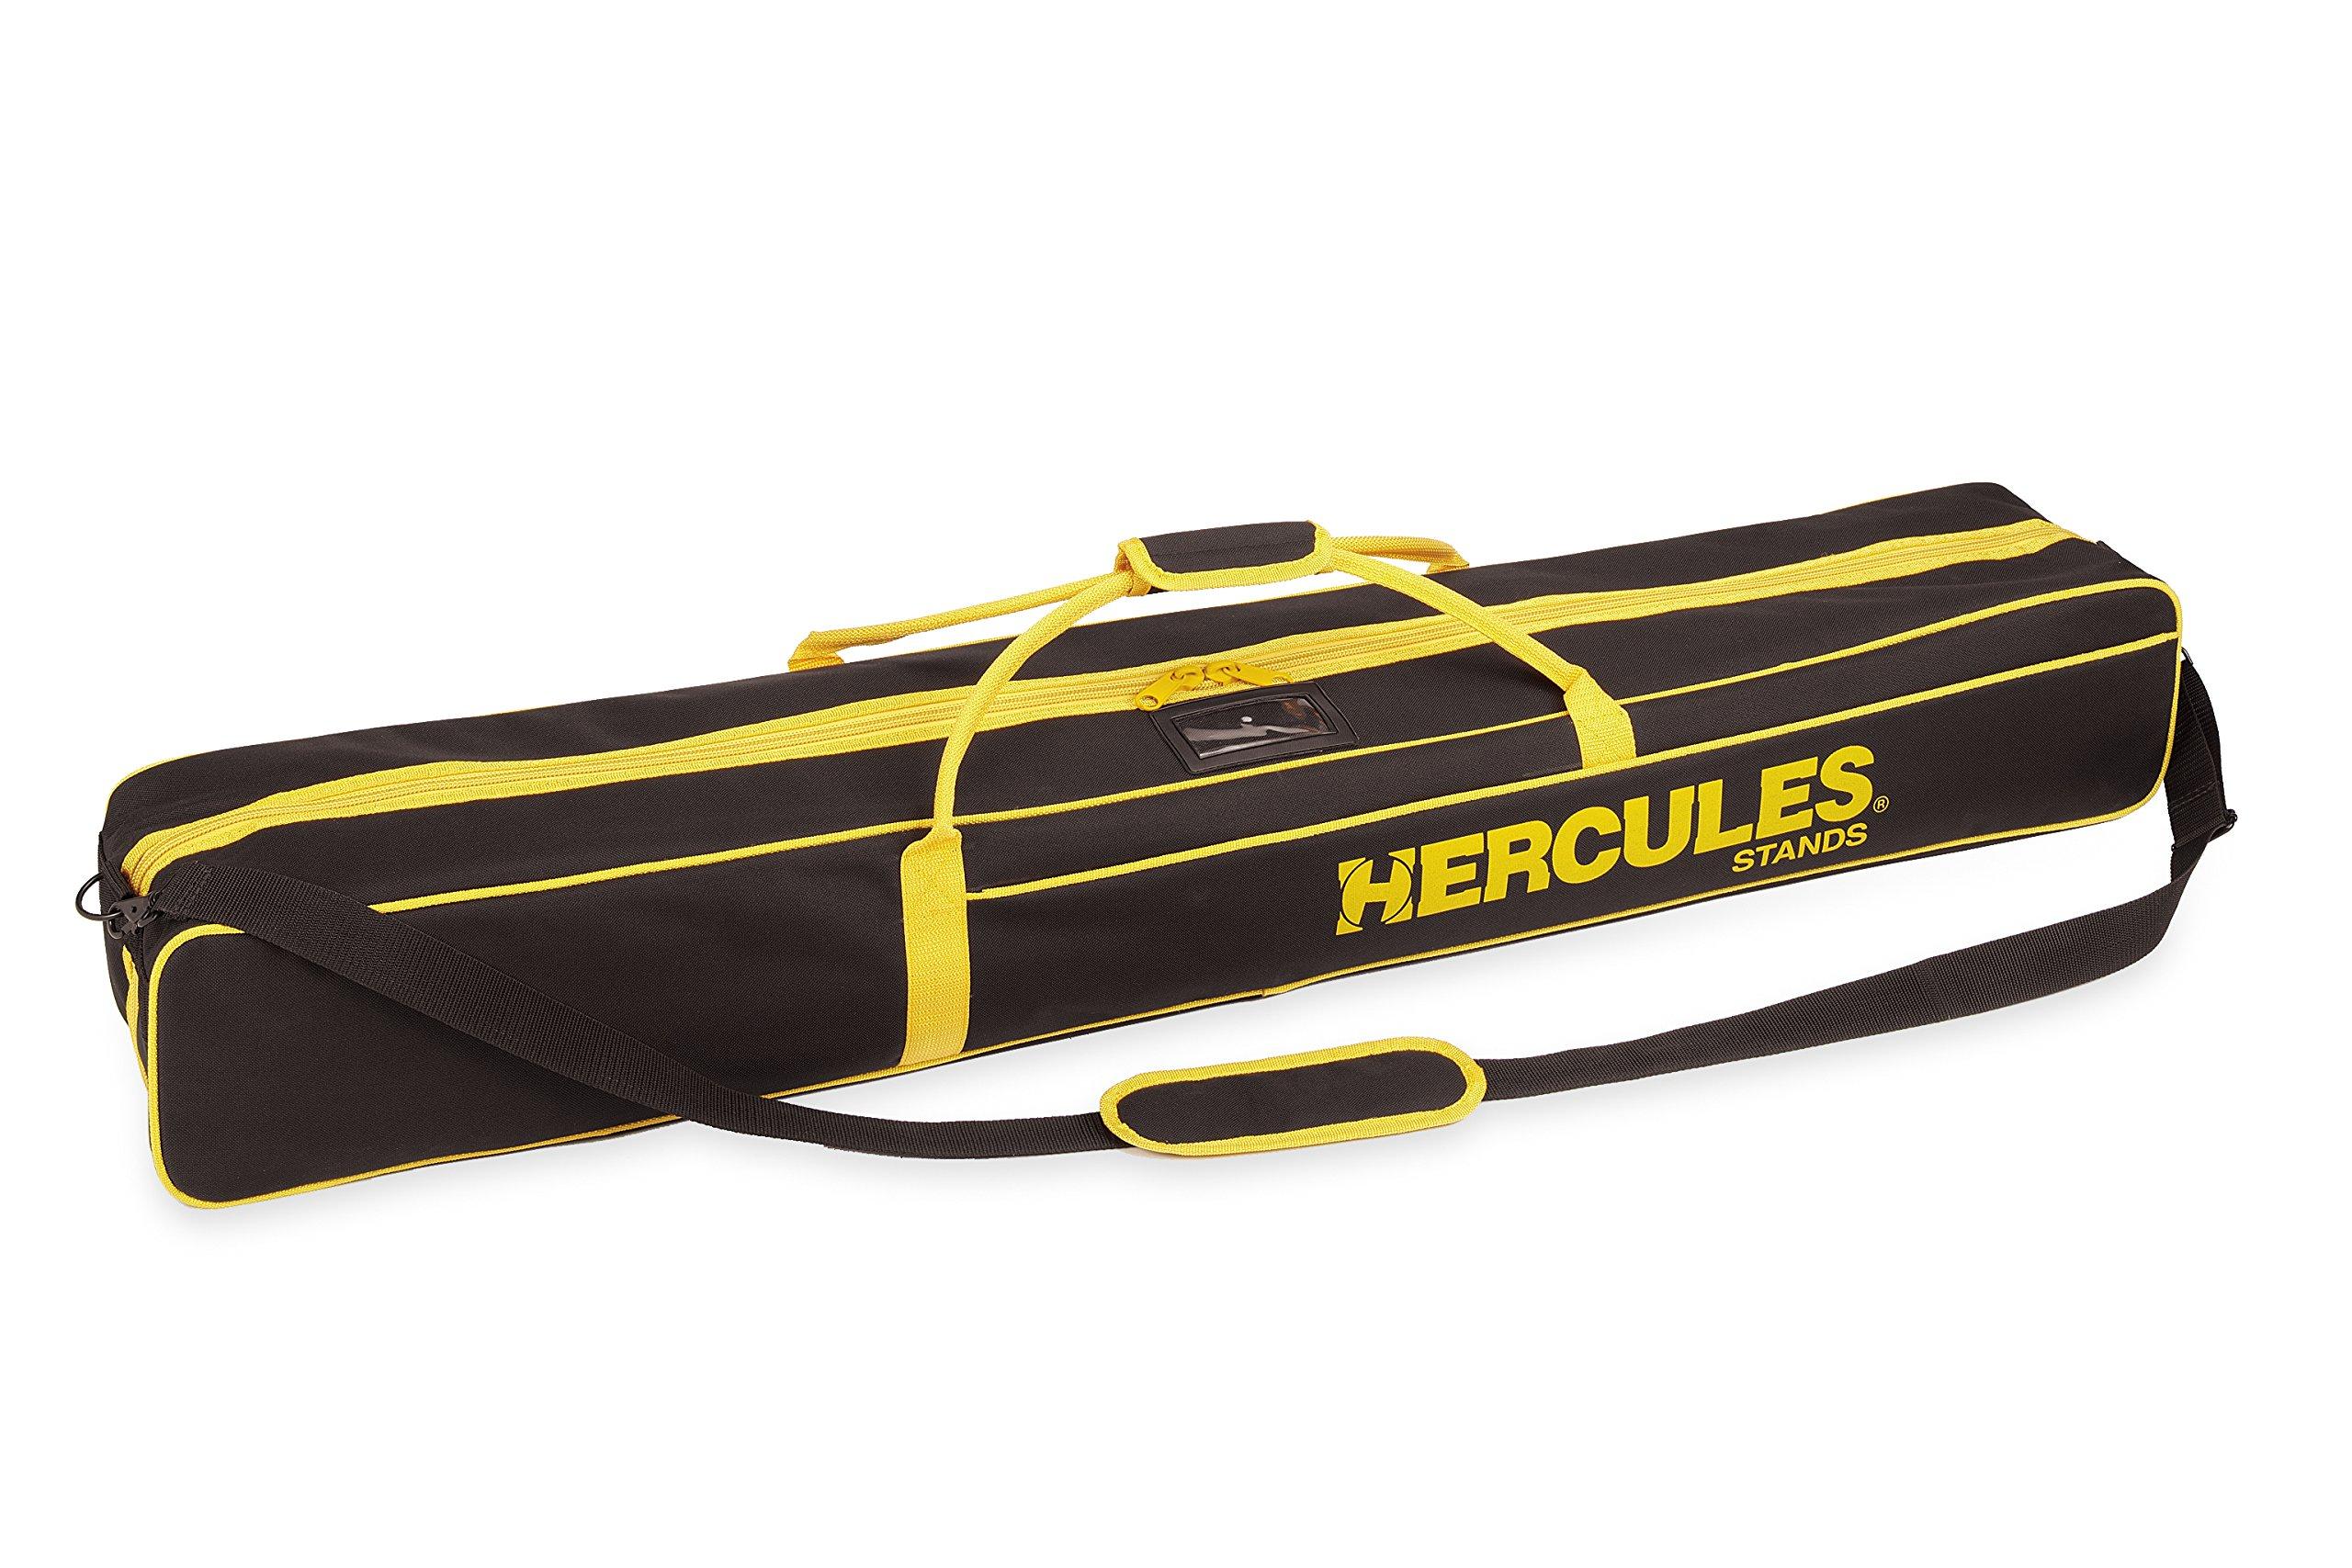 Hercules MSB001 SPKR/Microphone Stand Bag